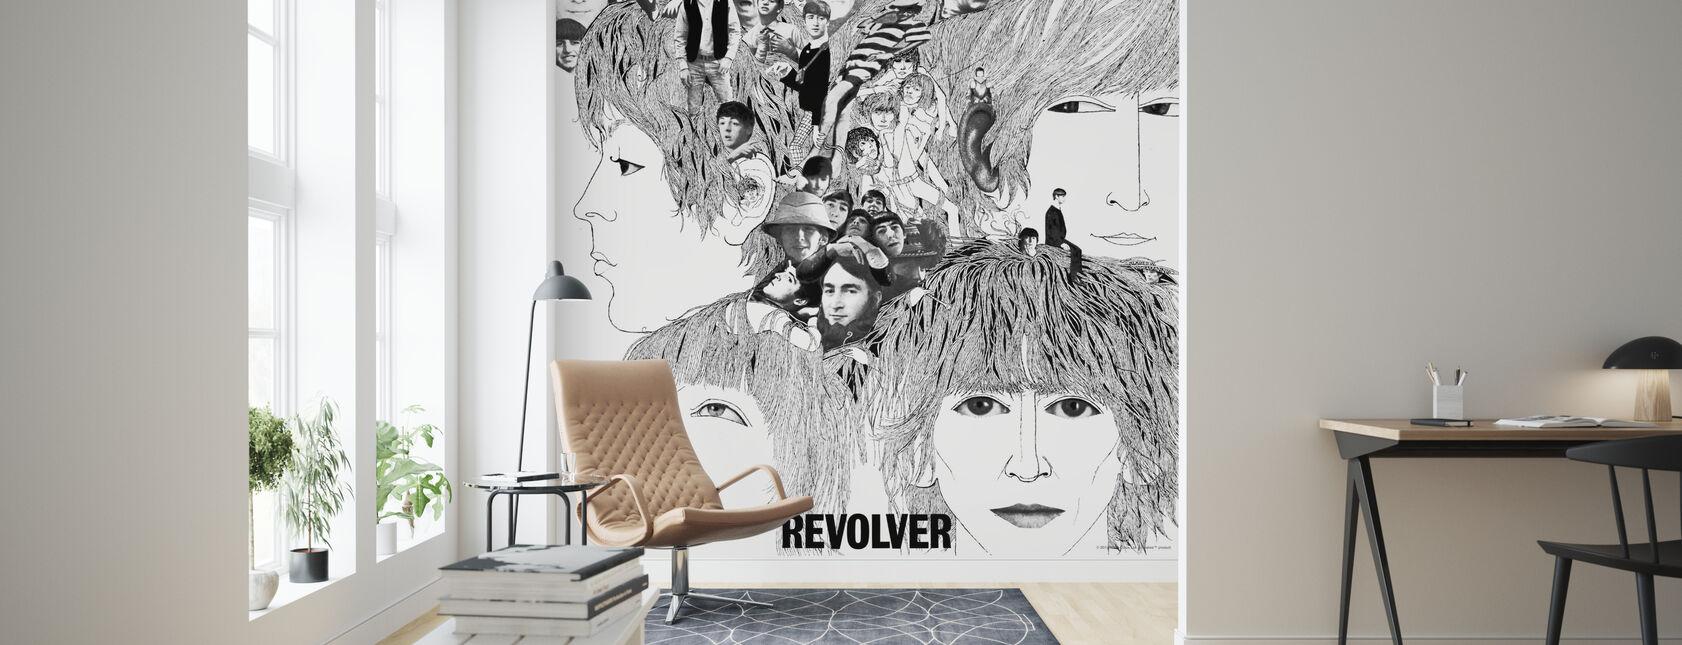 Beatles - Revolver - Wallpaper - Living Room